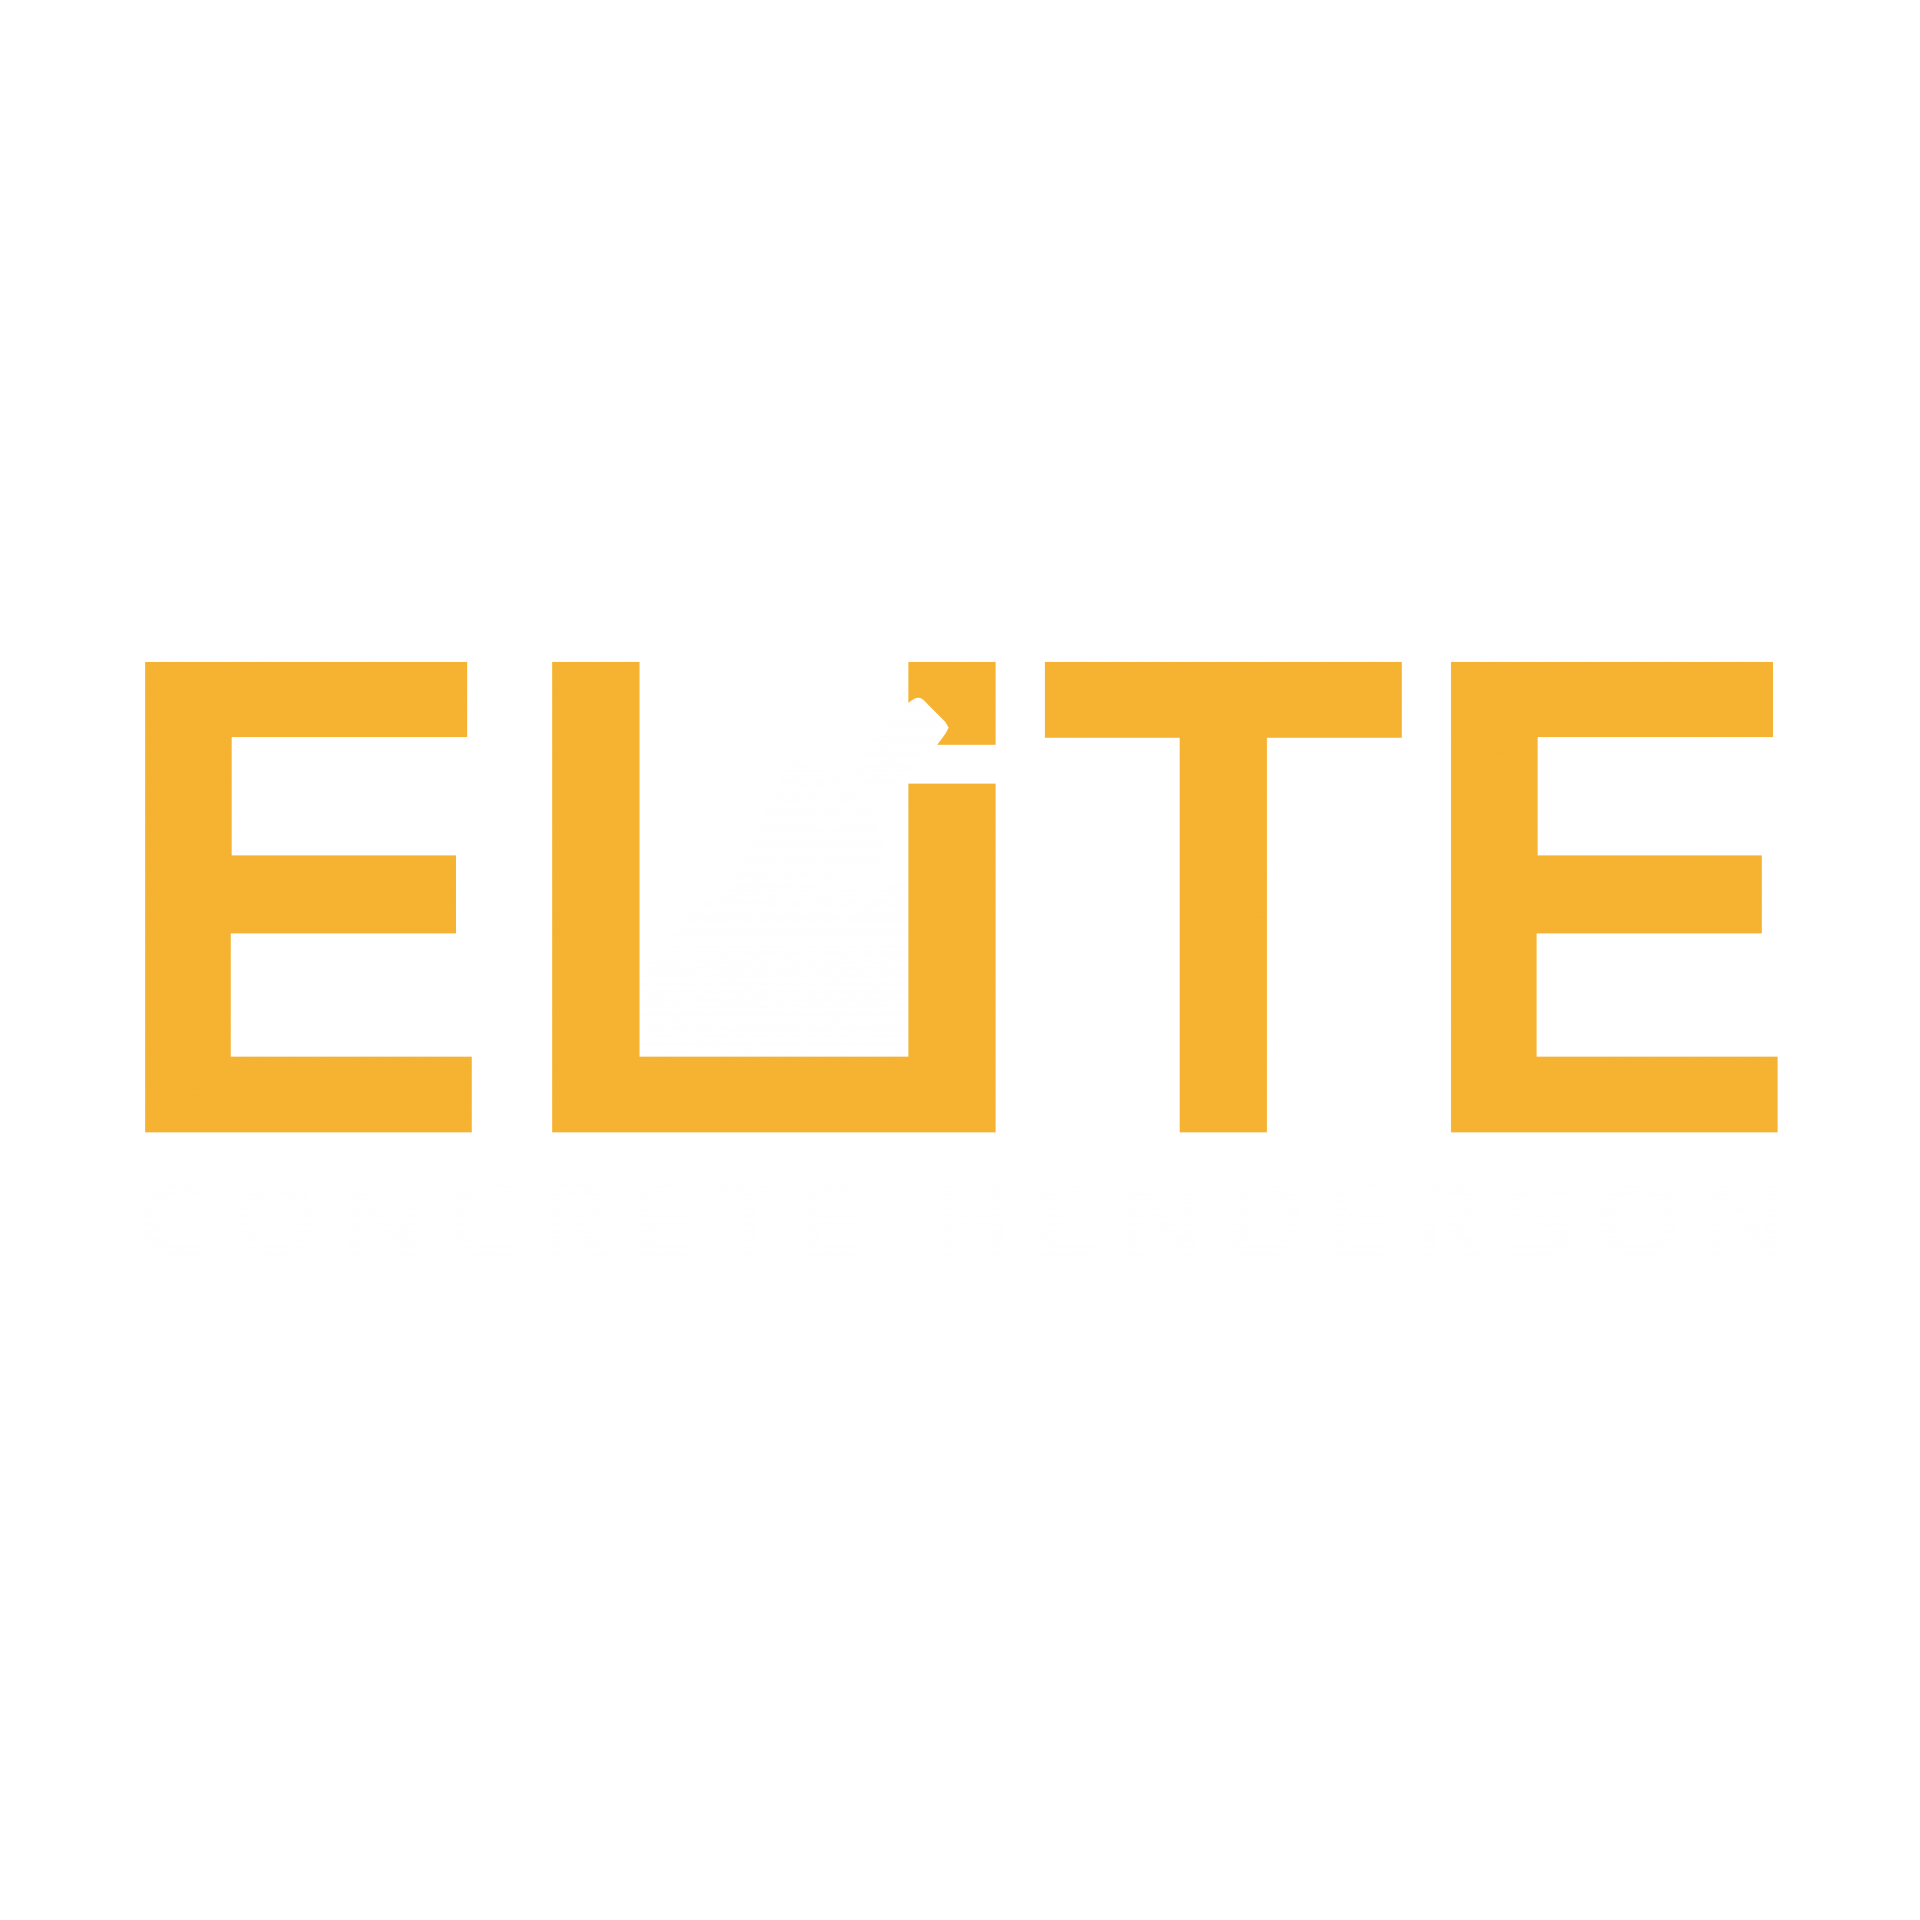 Elite Concrete Henderson